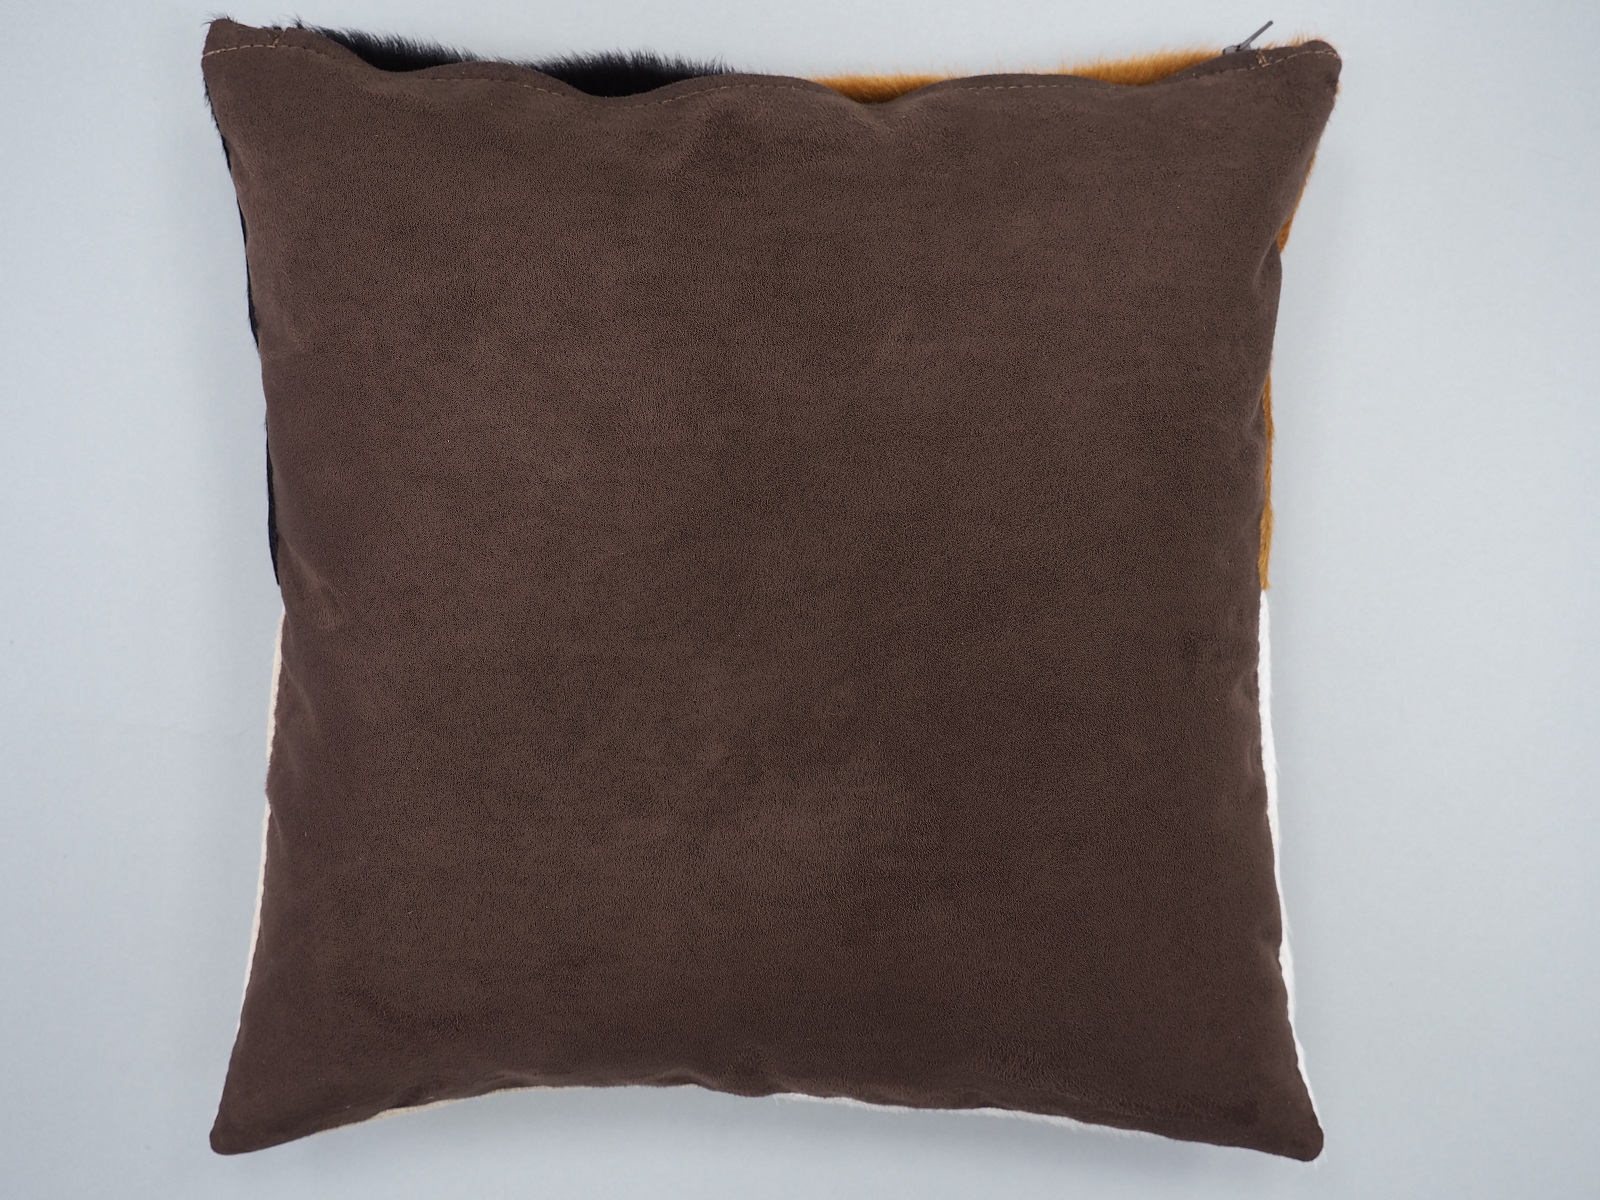 Декоративные чехлы на подушки из шкур коричнево-белые арт.: 23711